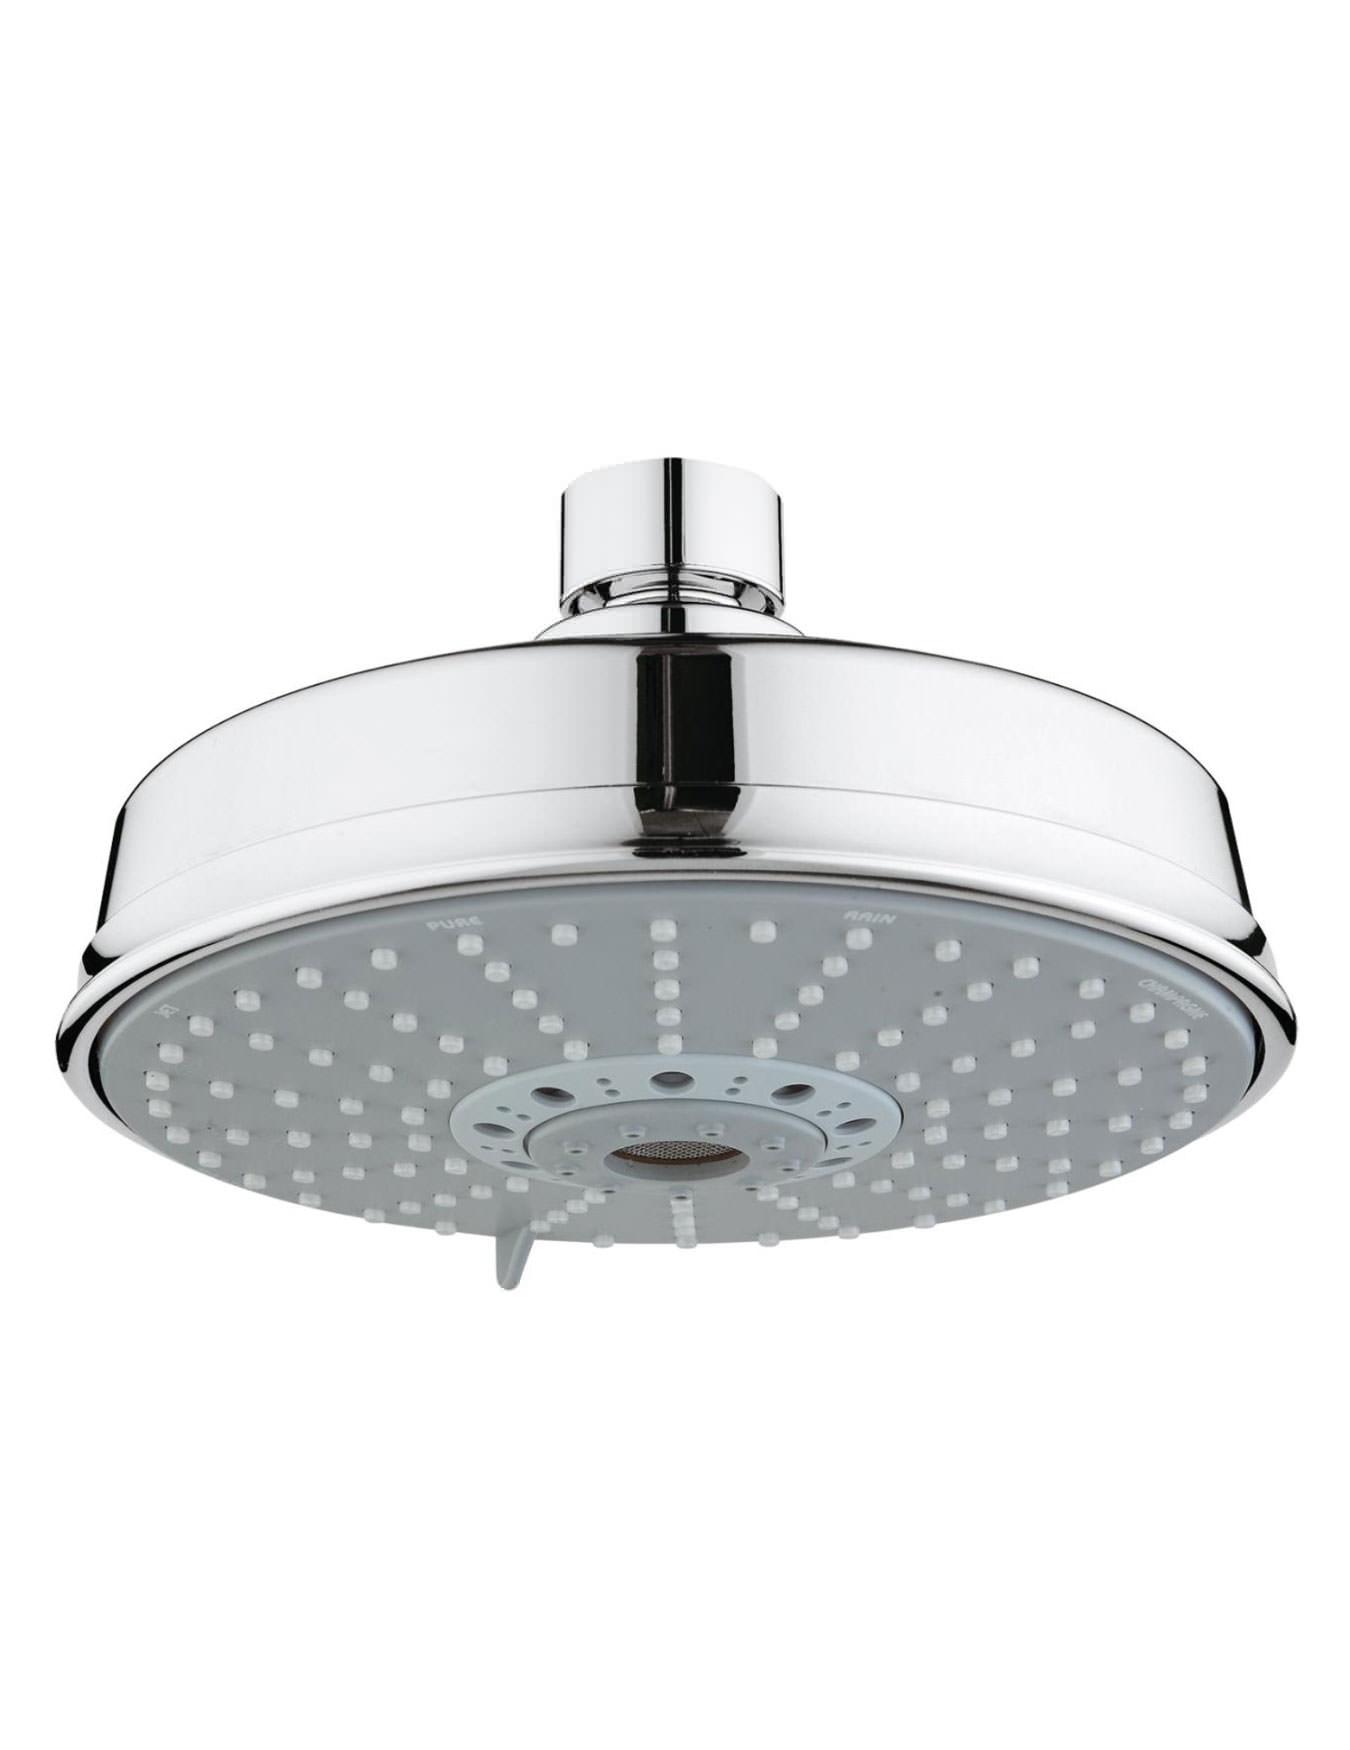 grohe rainshower rustic 160 four spray shower head chrome. Black Bedroom Furniture Sets. Home Design Ideas